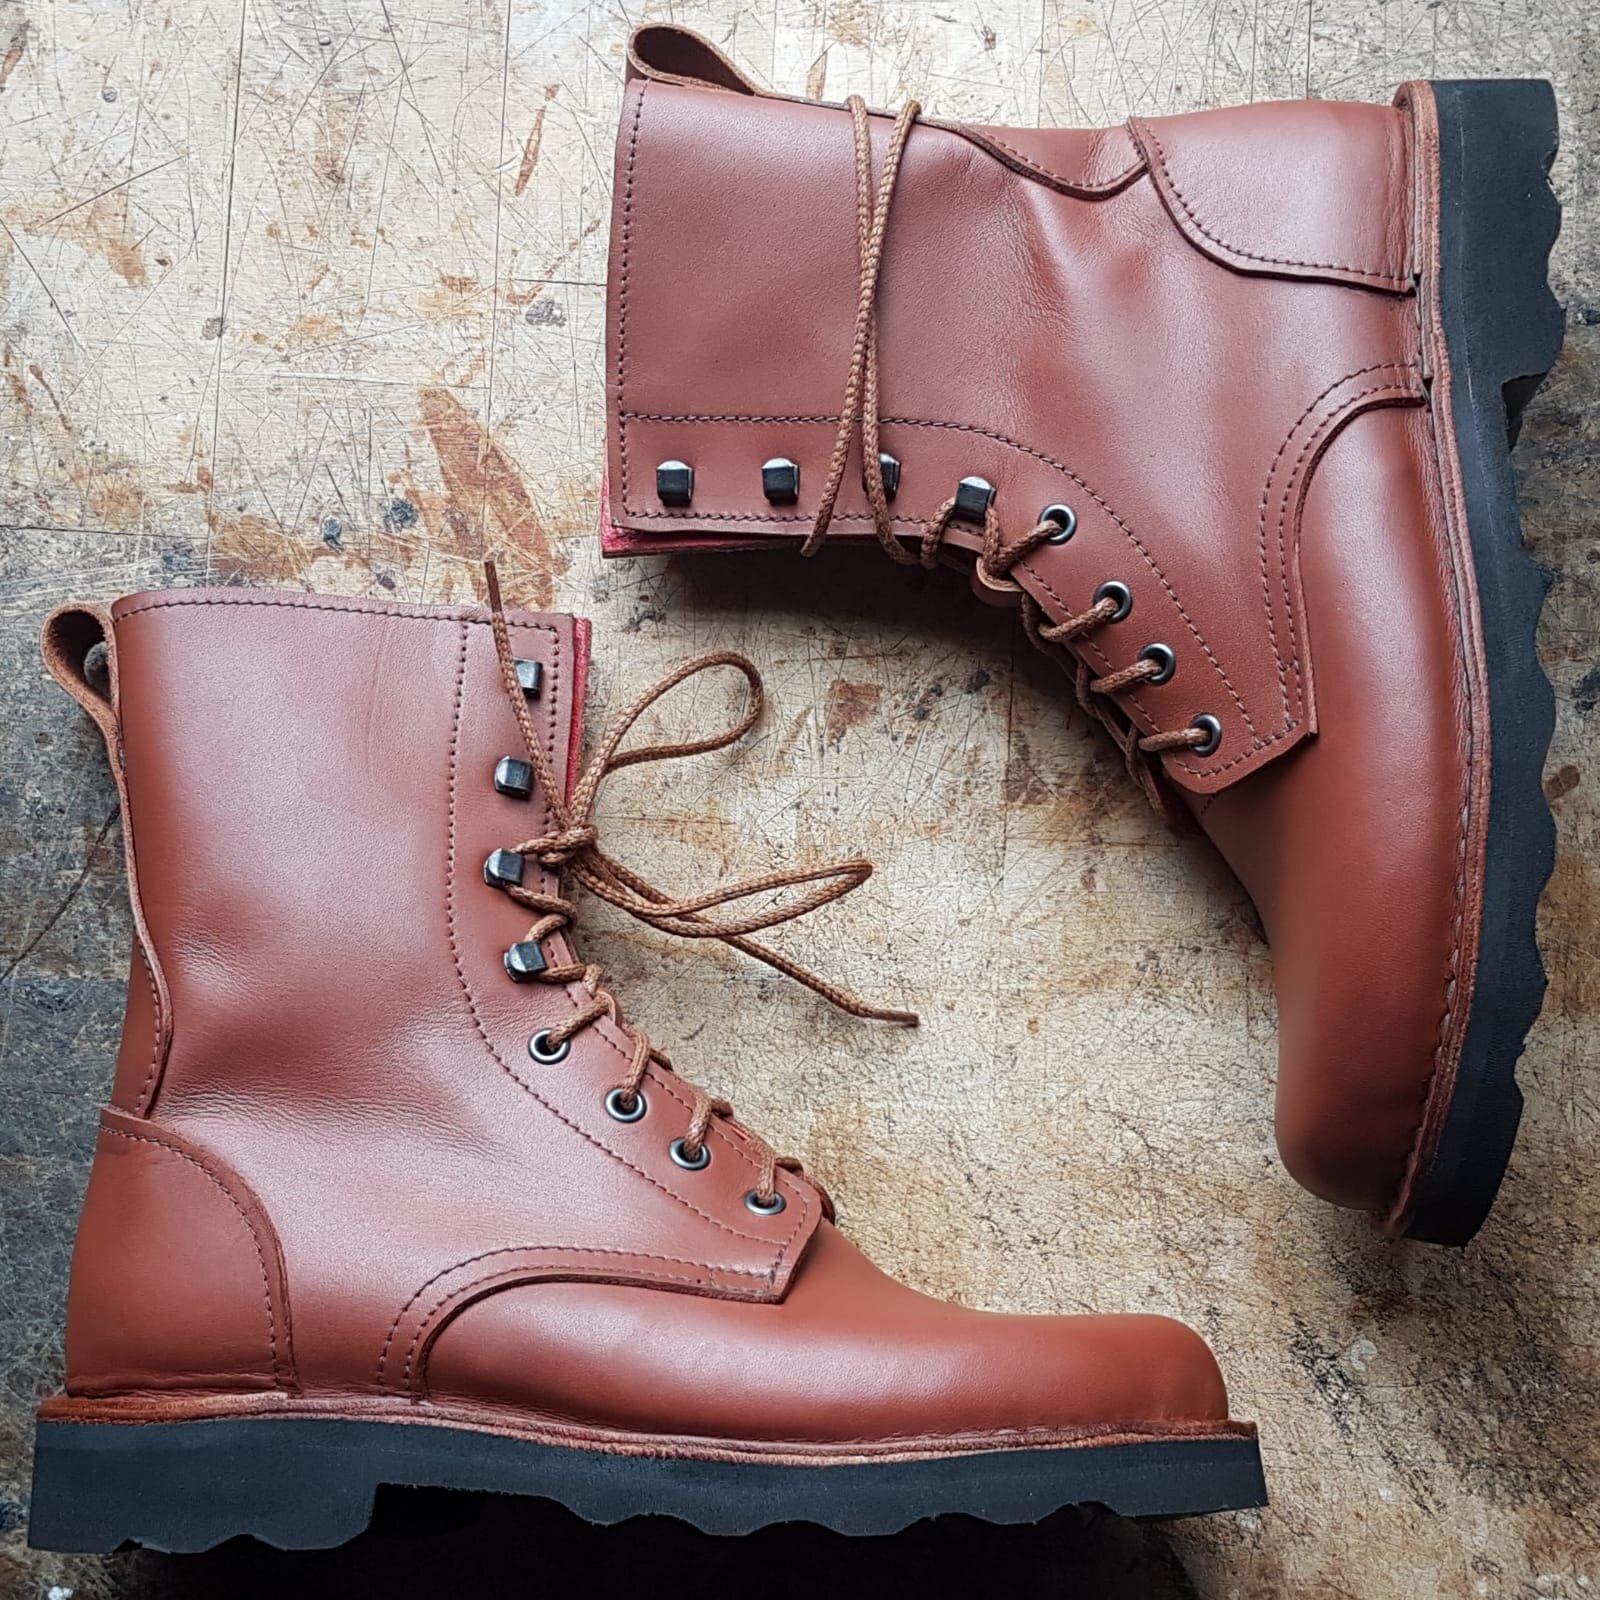 custom leather work boots